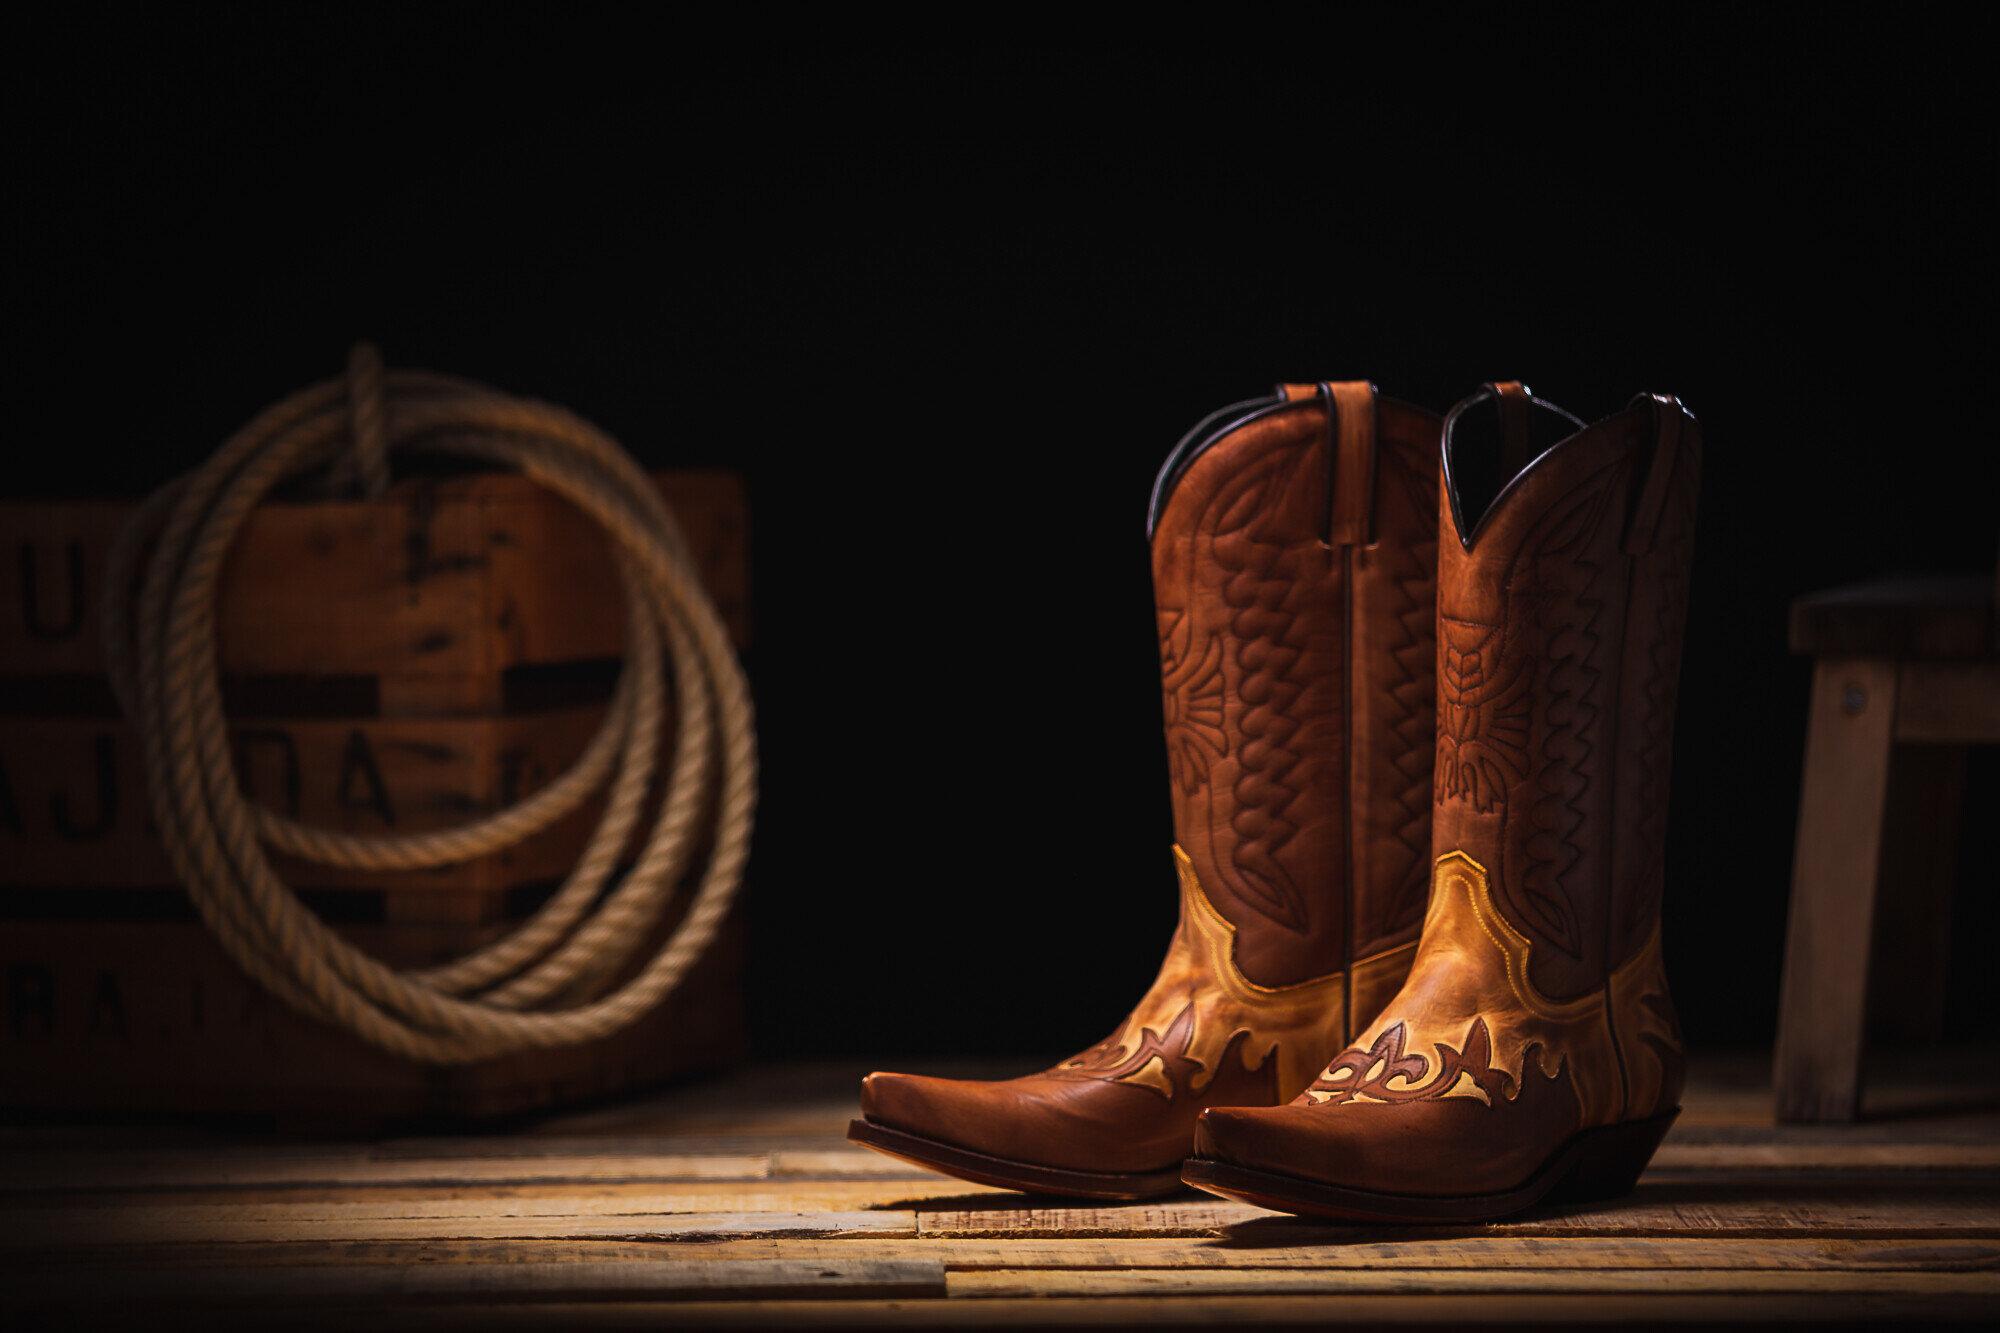 botas country hombre